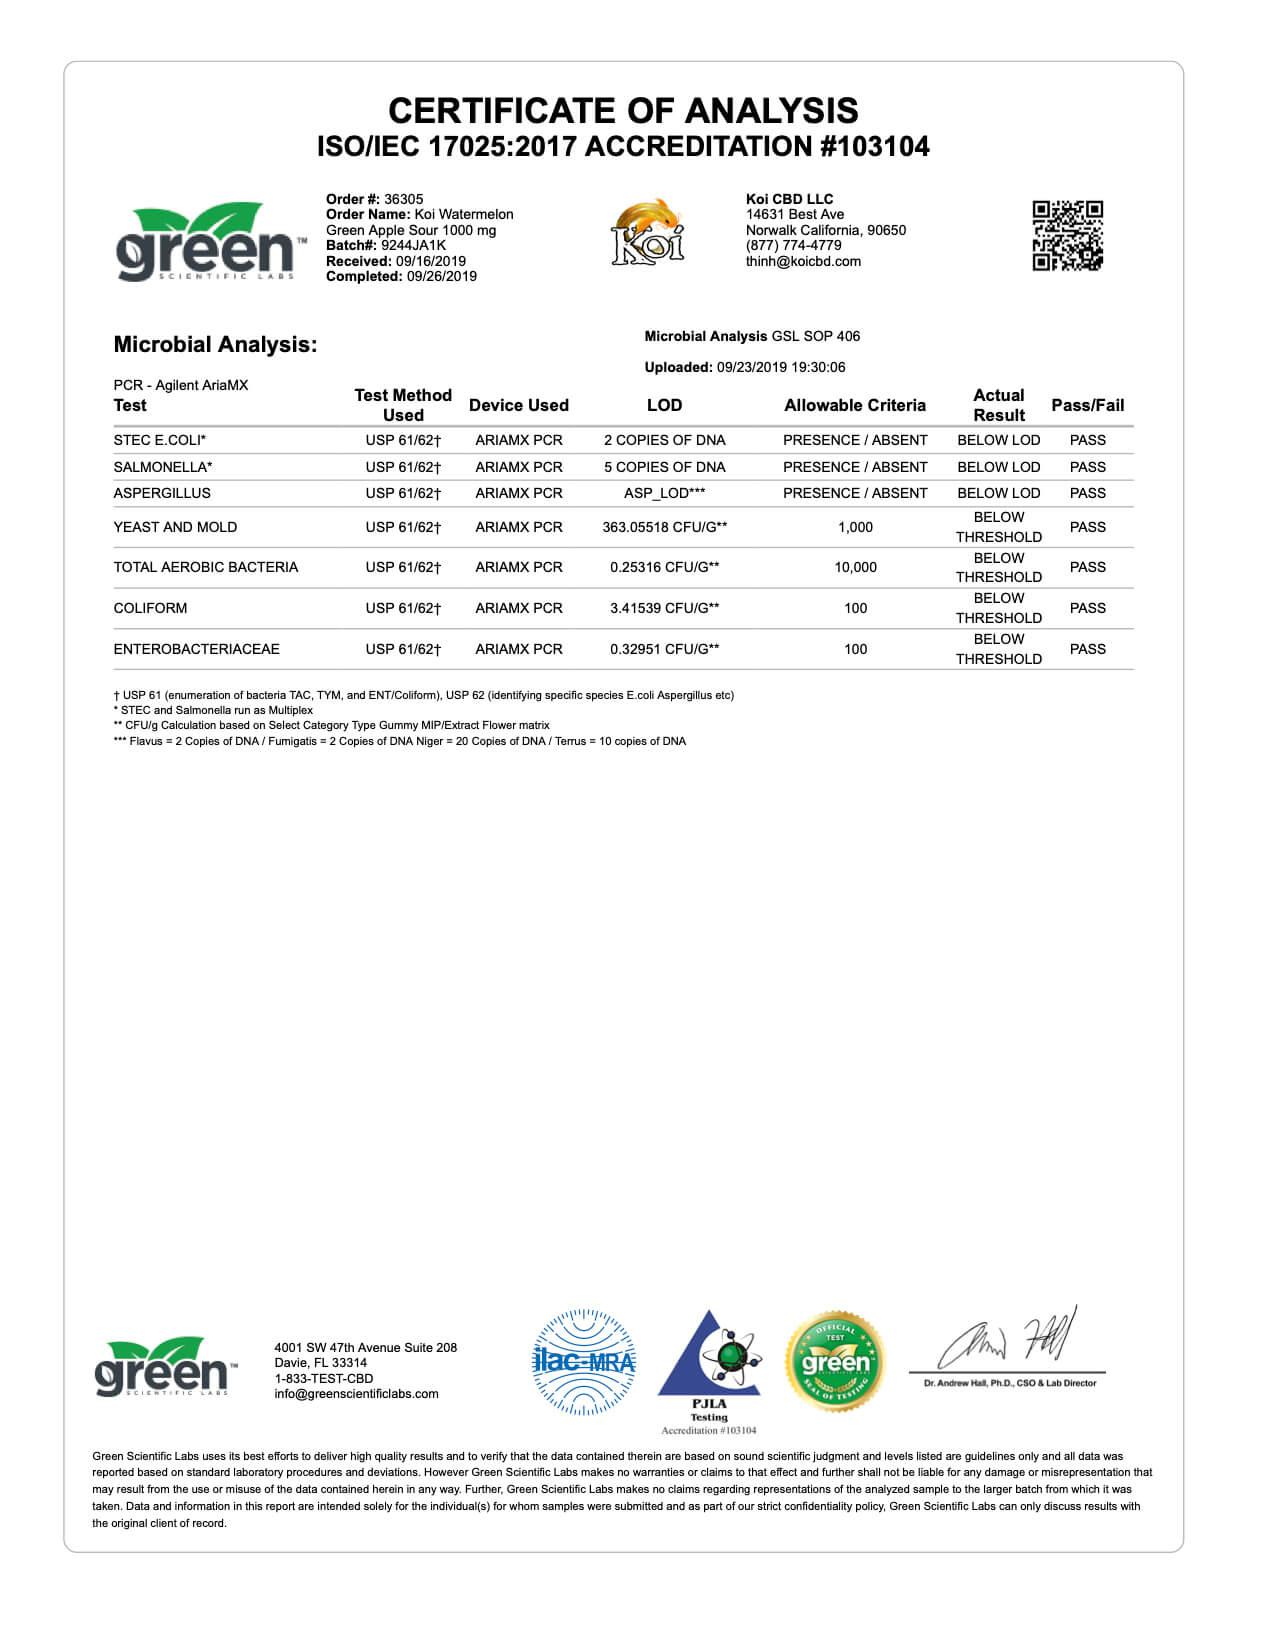 Koi CBD Watermelon Green Apple Sour Vape Oil 1000mg page5